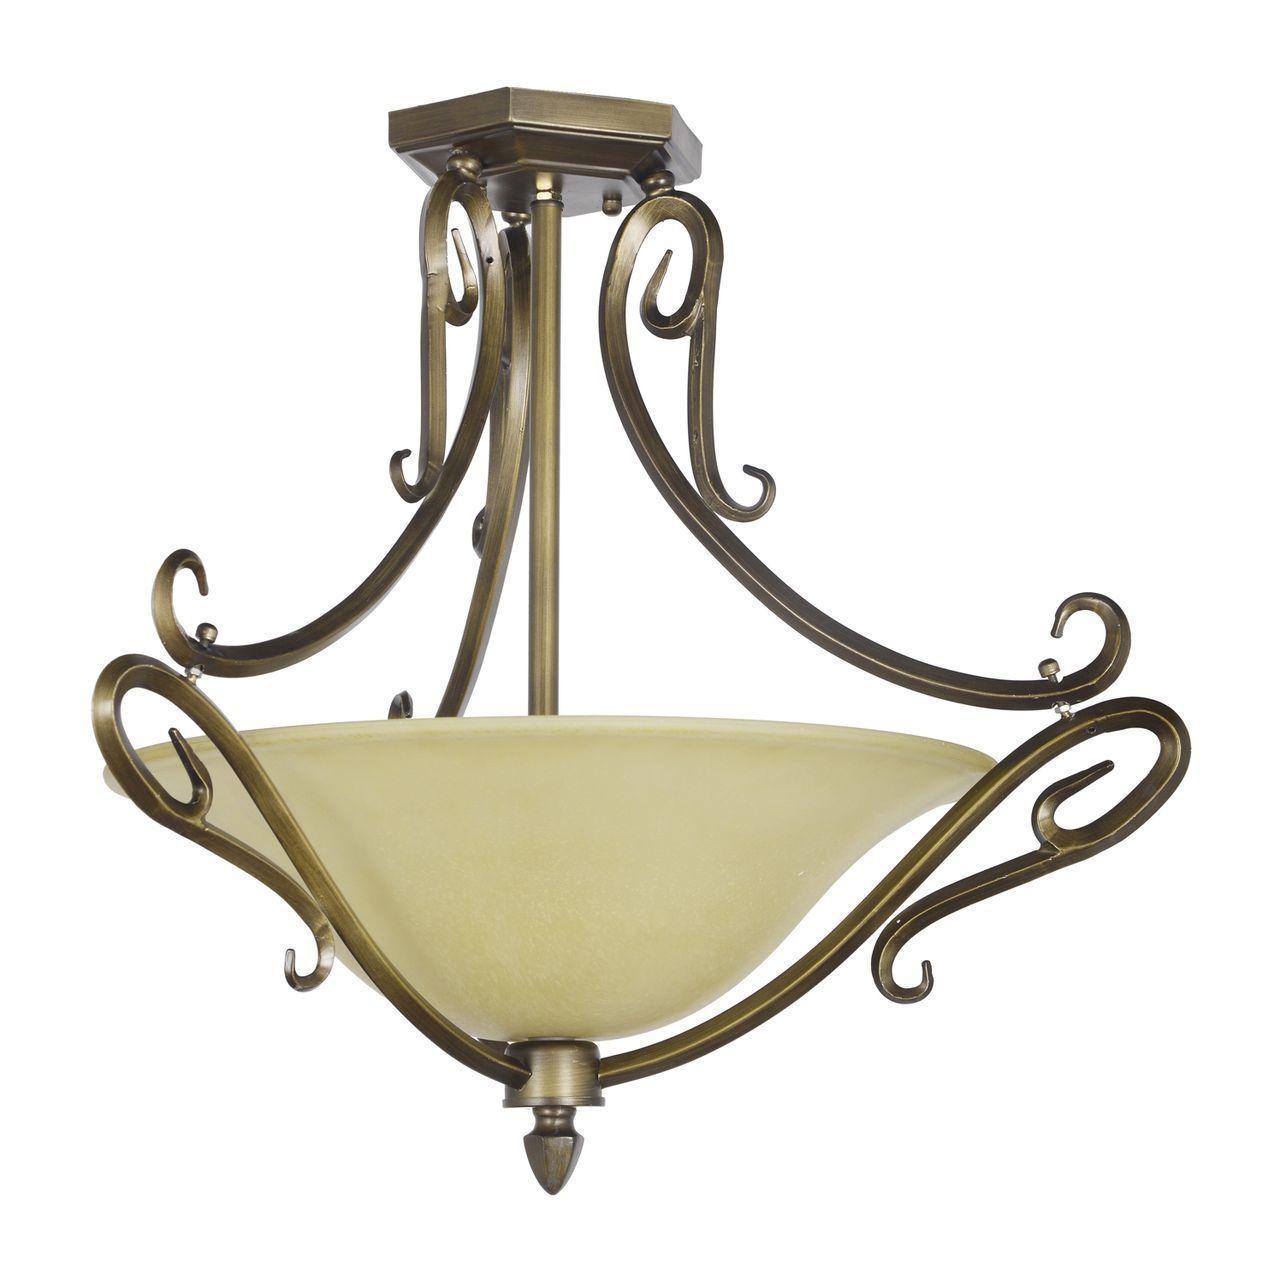 Подвесной светильник Dio DArte Elite Casello E 1.5.54.501 BR